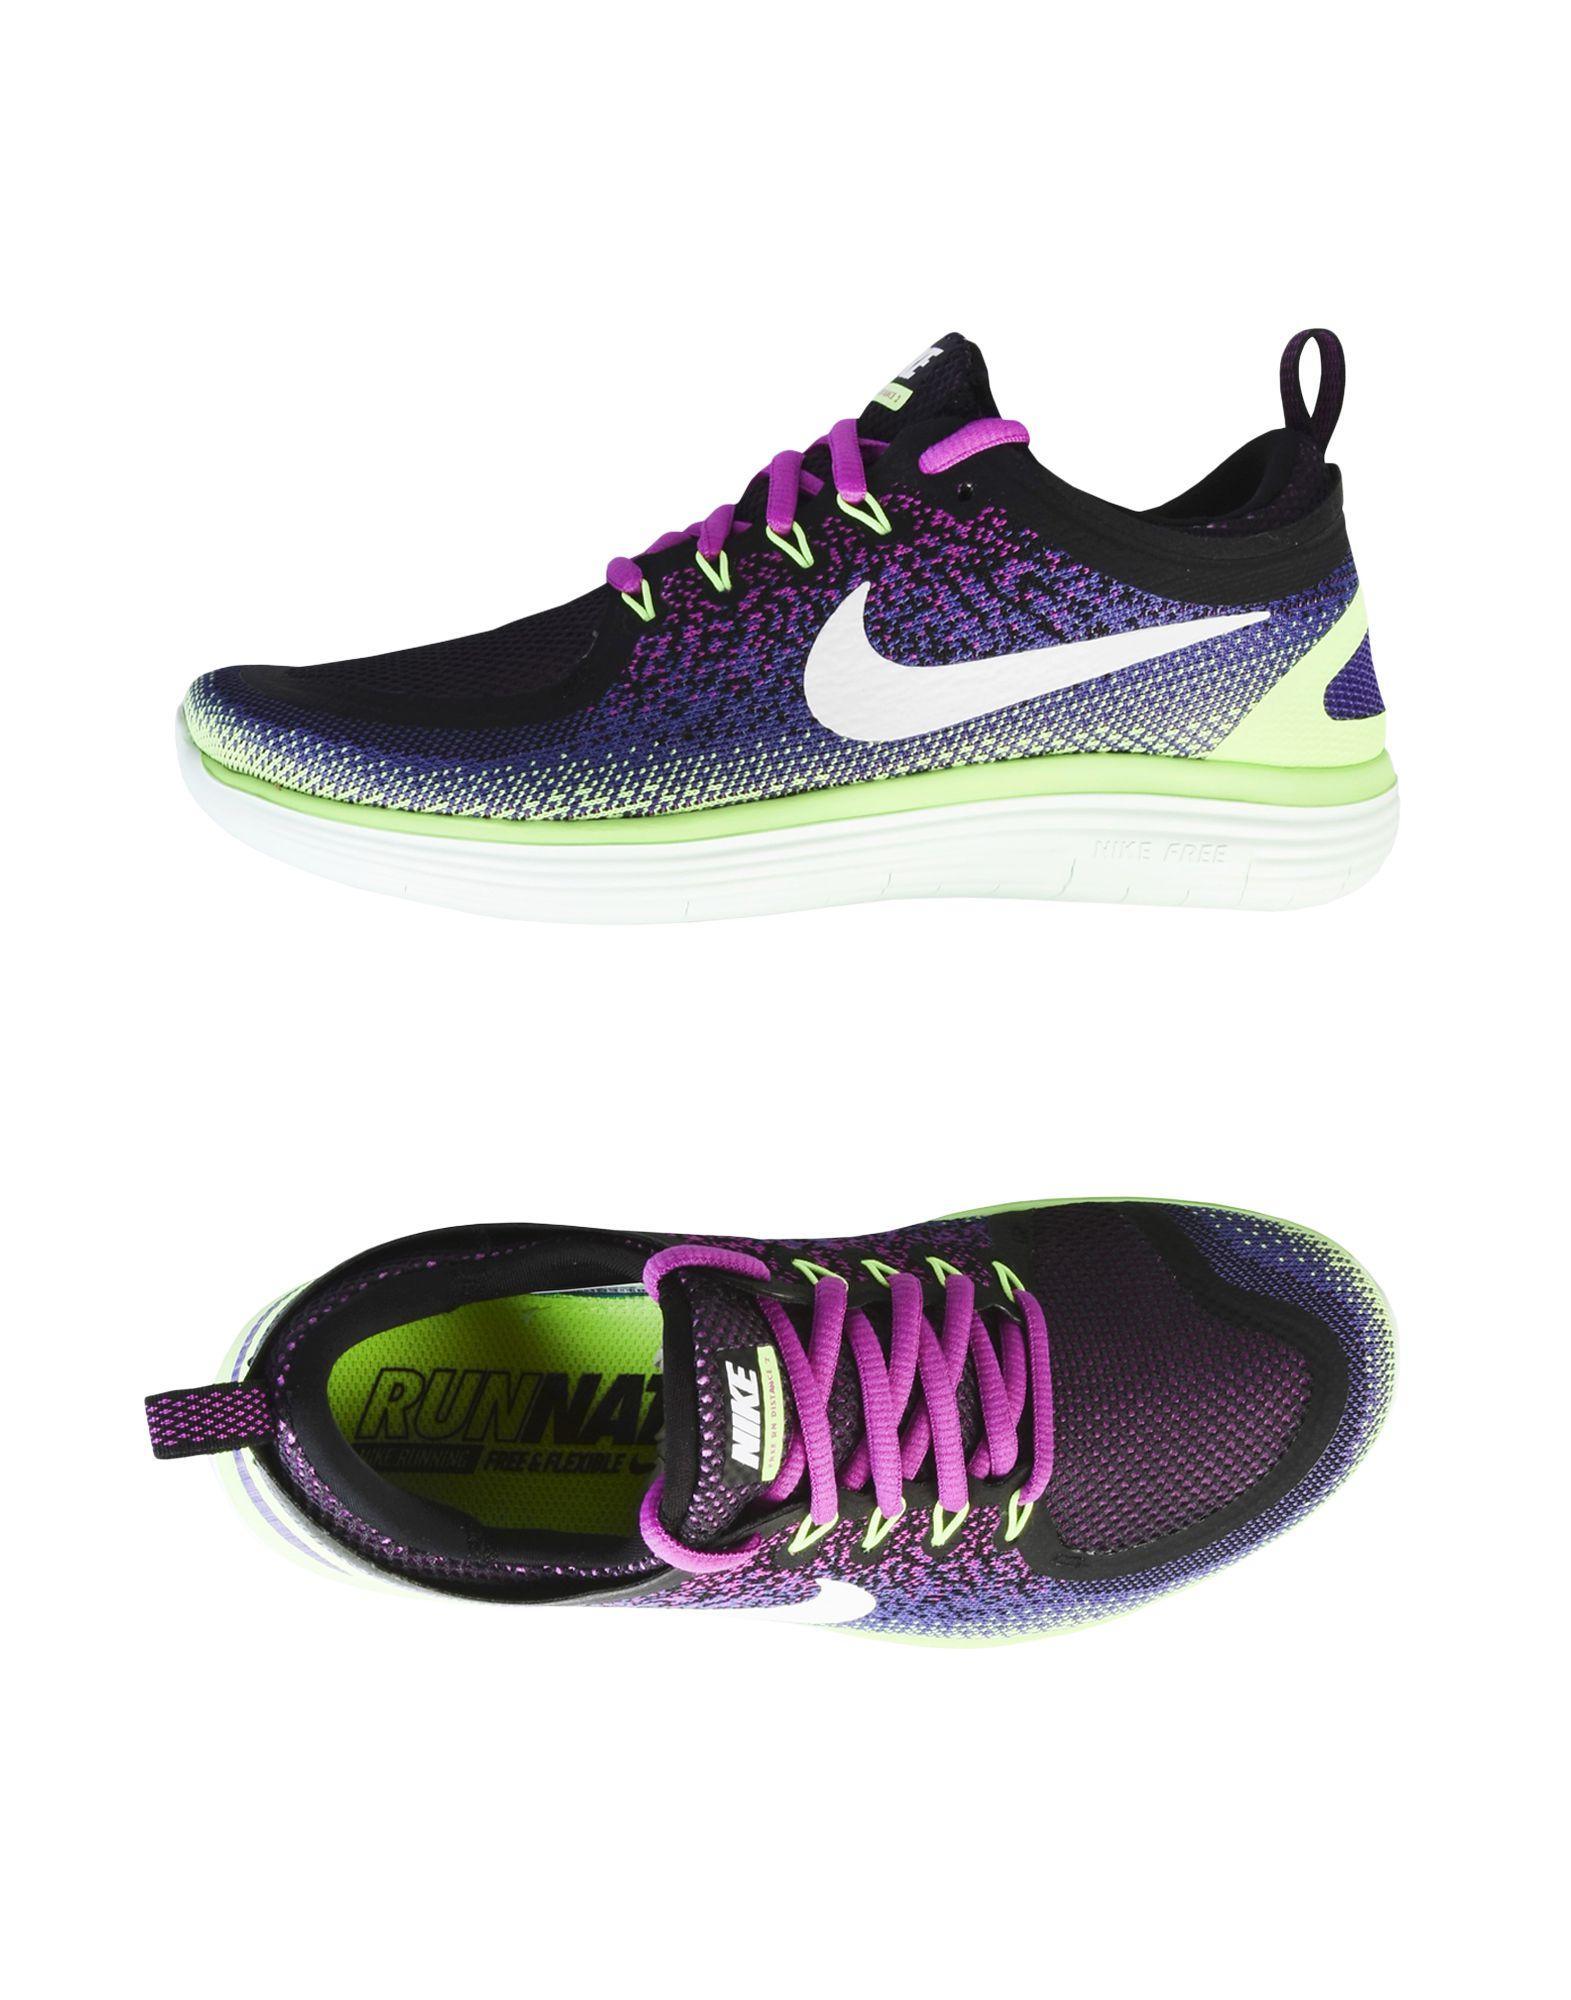 NIKE Damen Low Sneakers & Tennisschuhe Farbe Dunkelviolett Größe 9 jetztbilligerkaufen